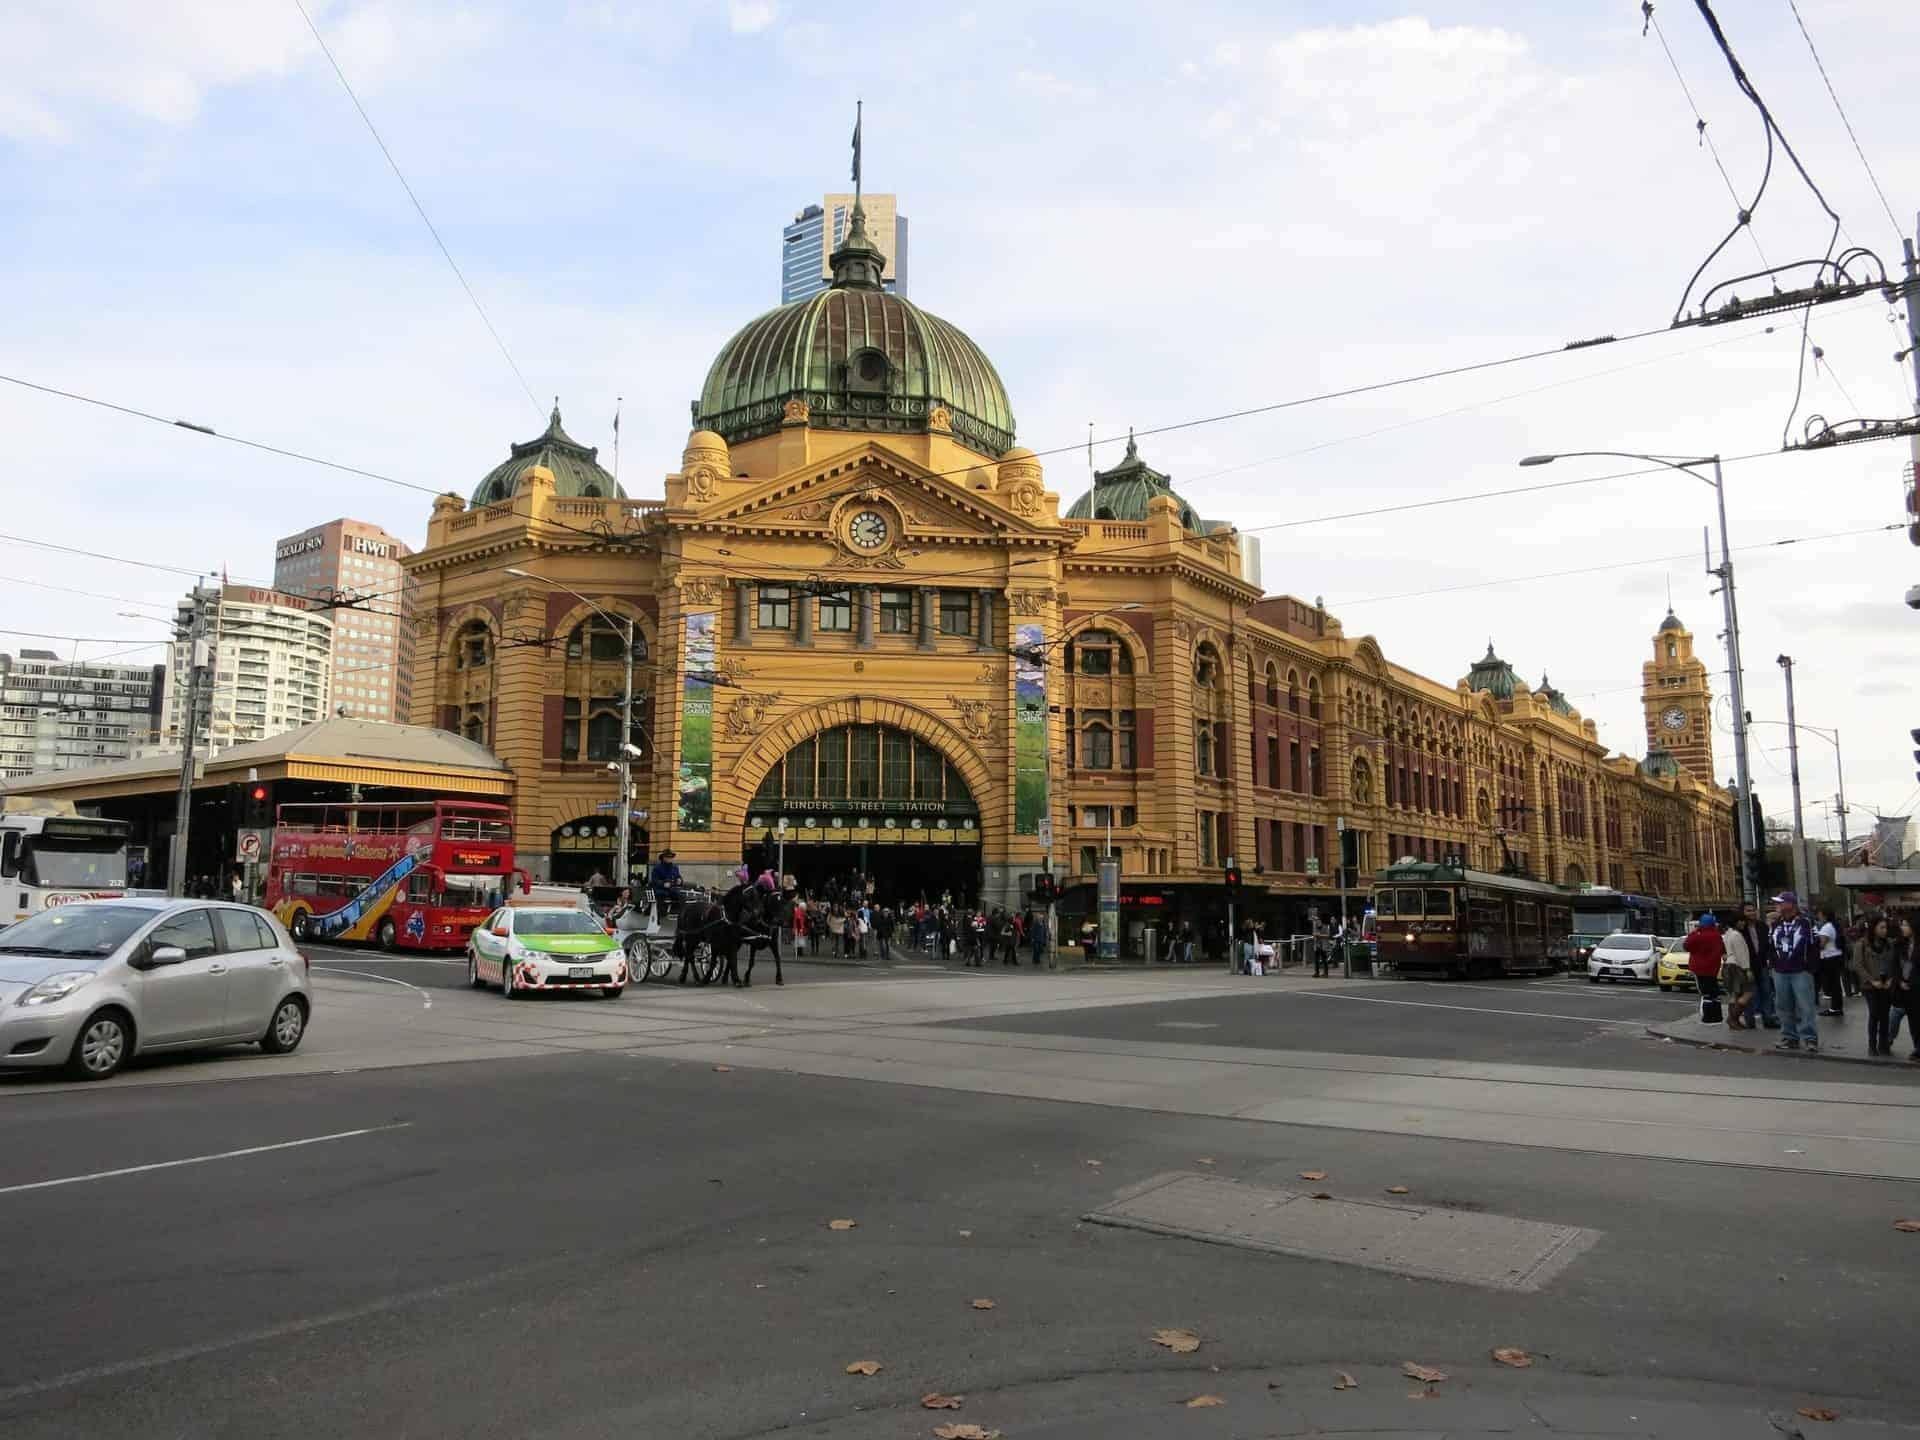 EssentialMelbourne_Point1Narration2_FlindersStreetStation